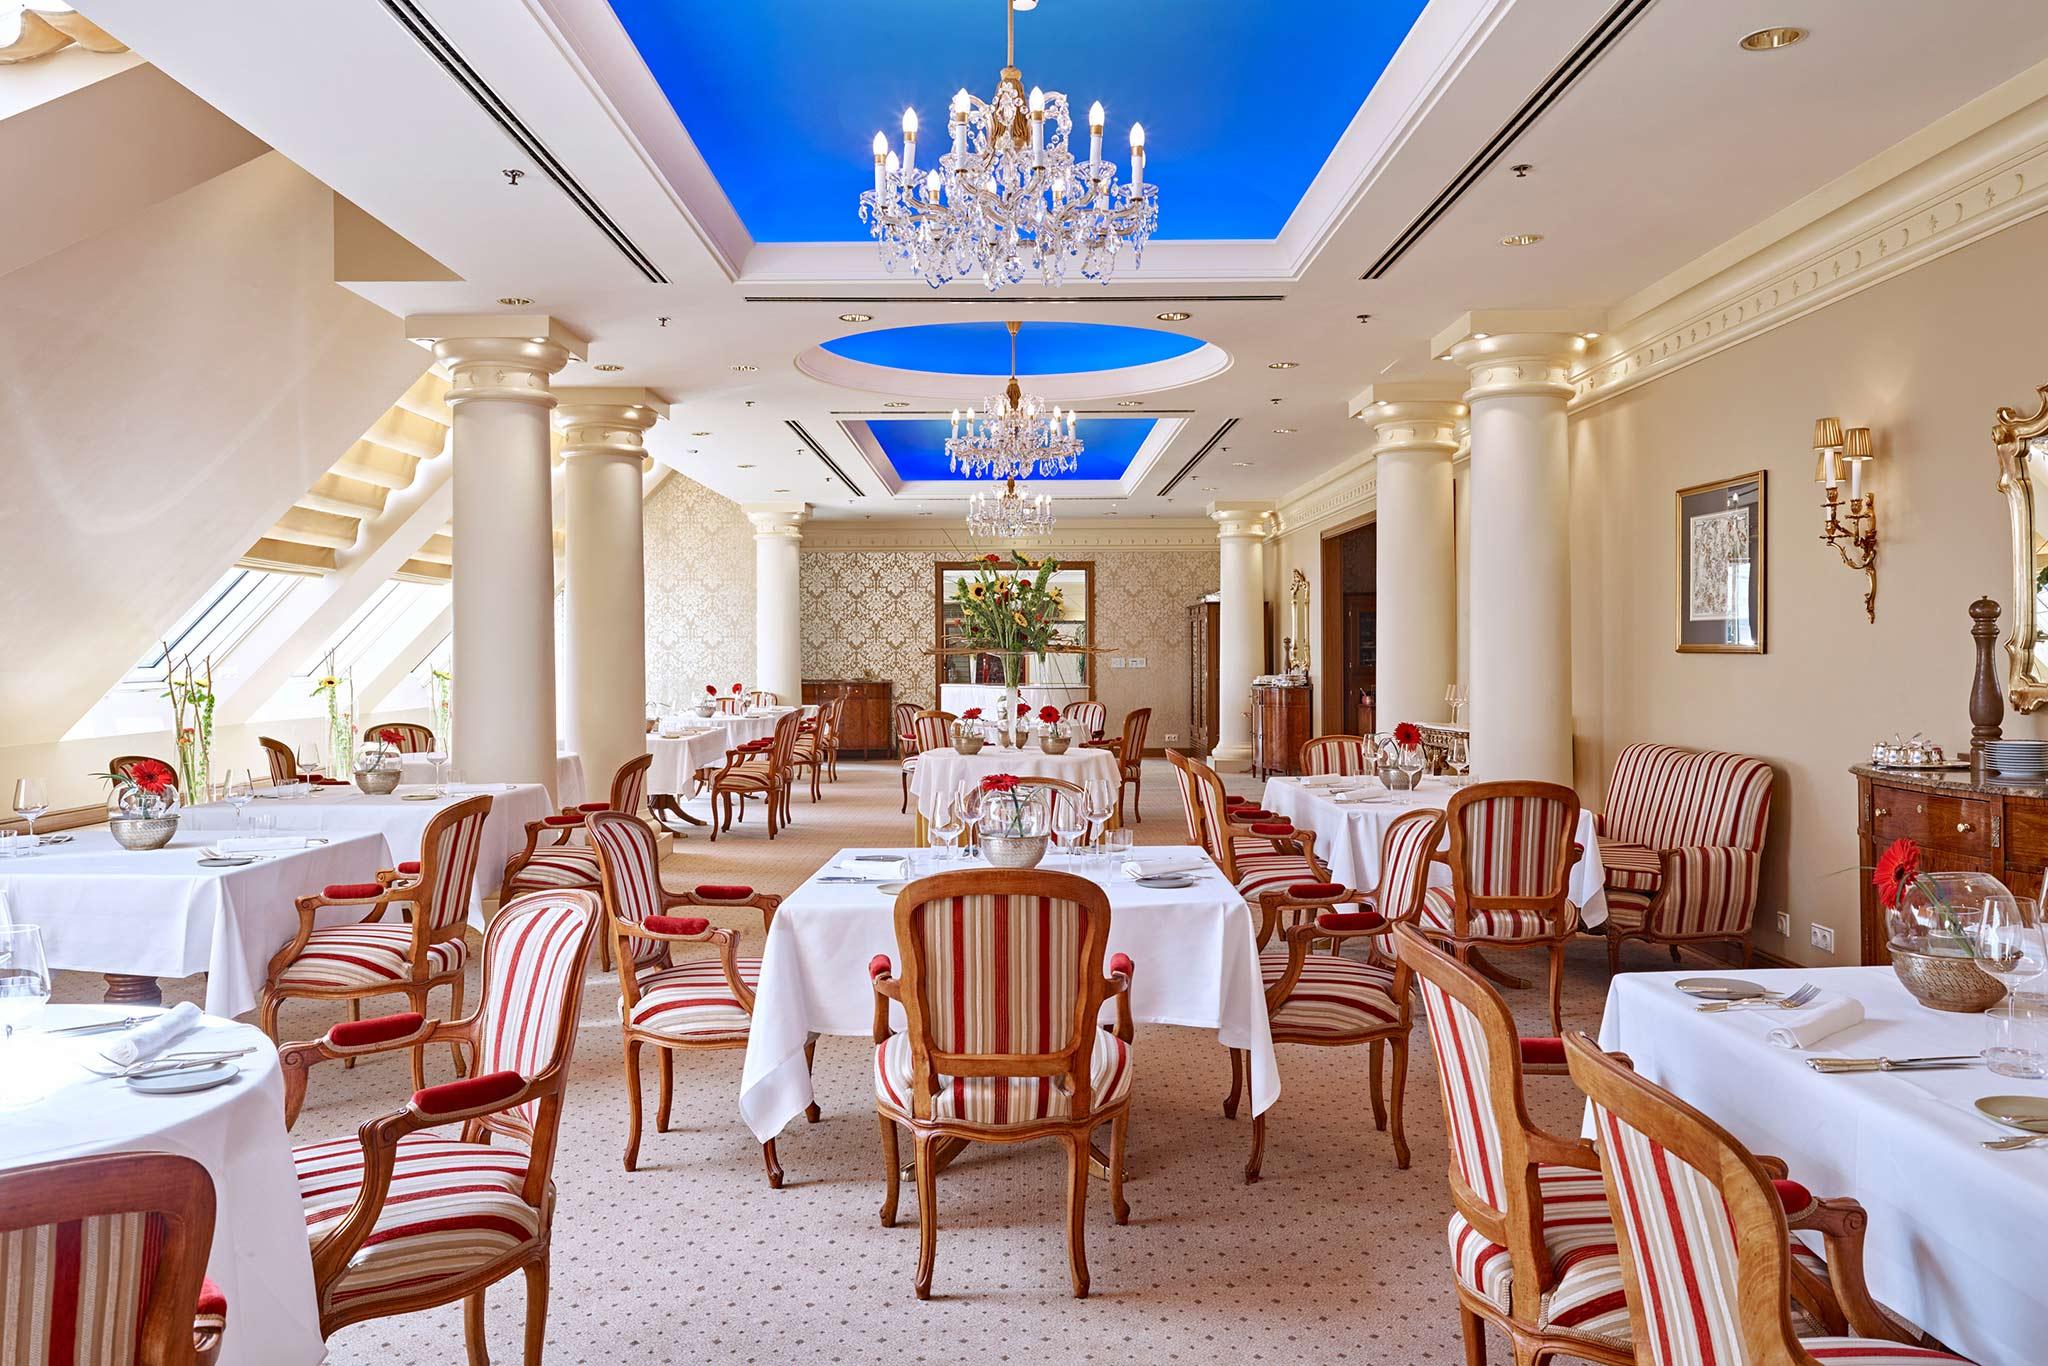 Restaurant Le Ciel By Toni Morwald Im Grand Hotel In 1010 Wien